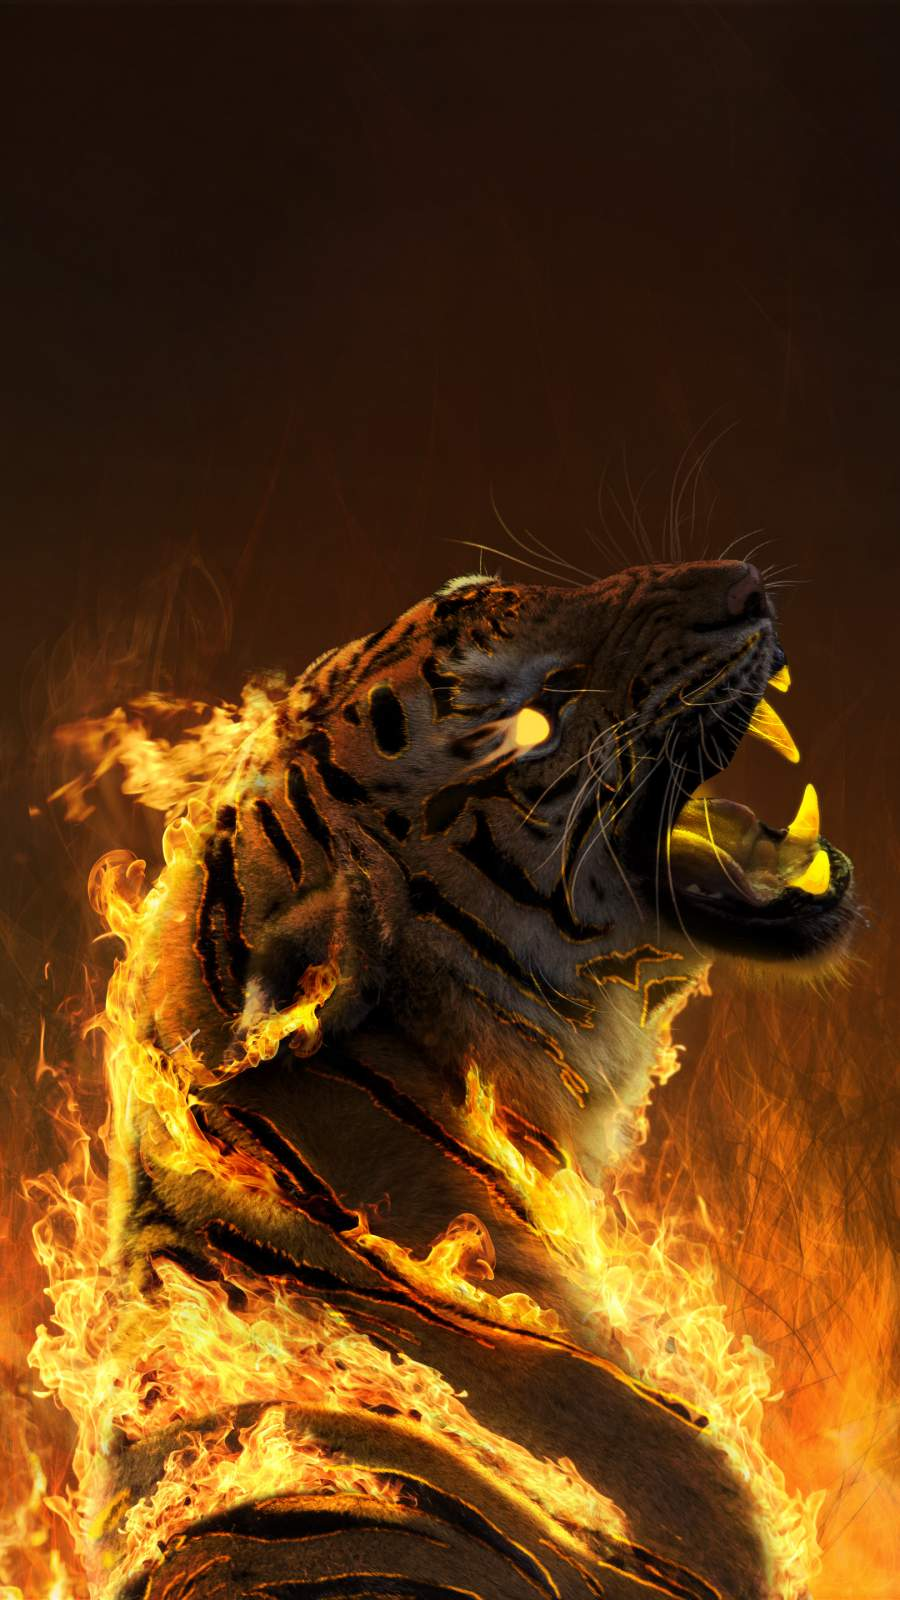 Burning Tiger iPhone Wallpaper